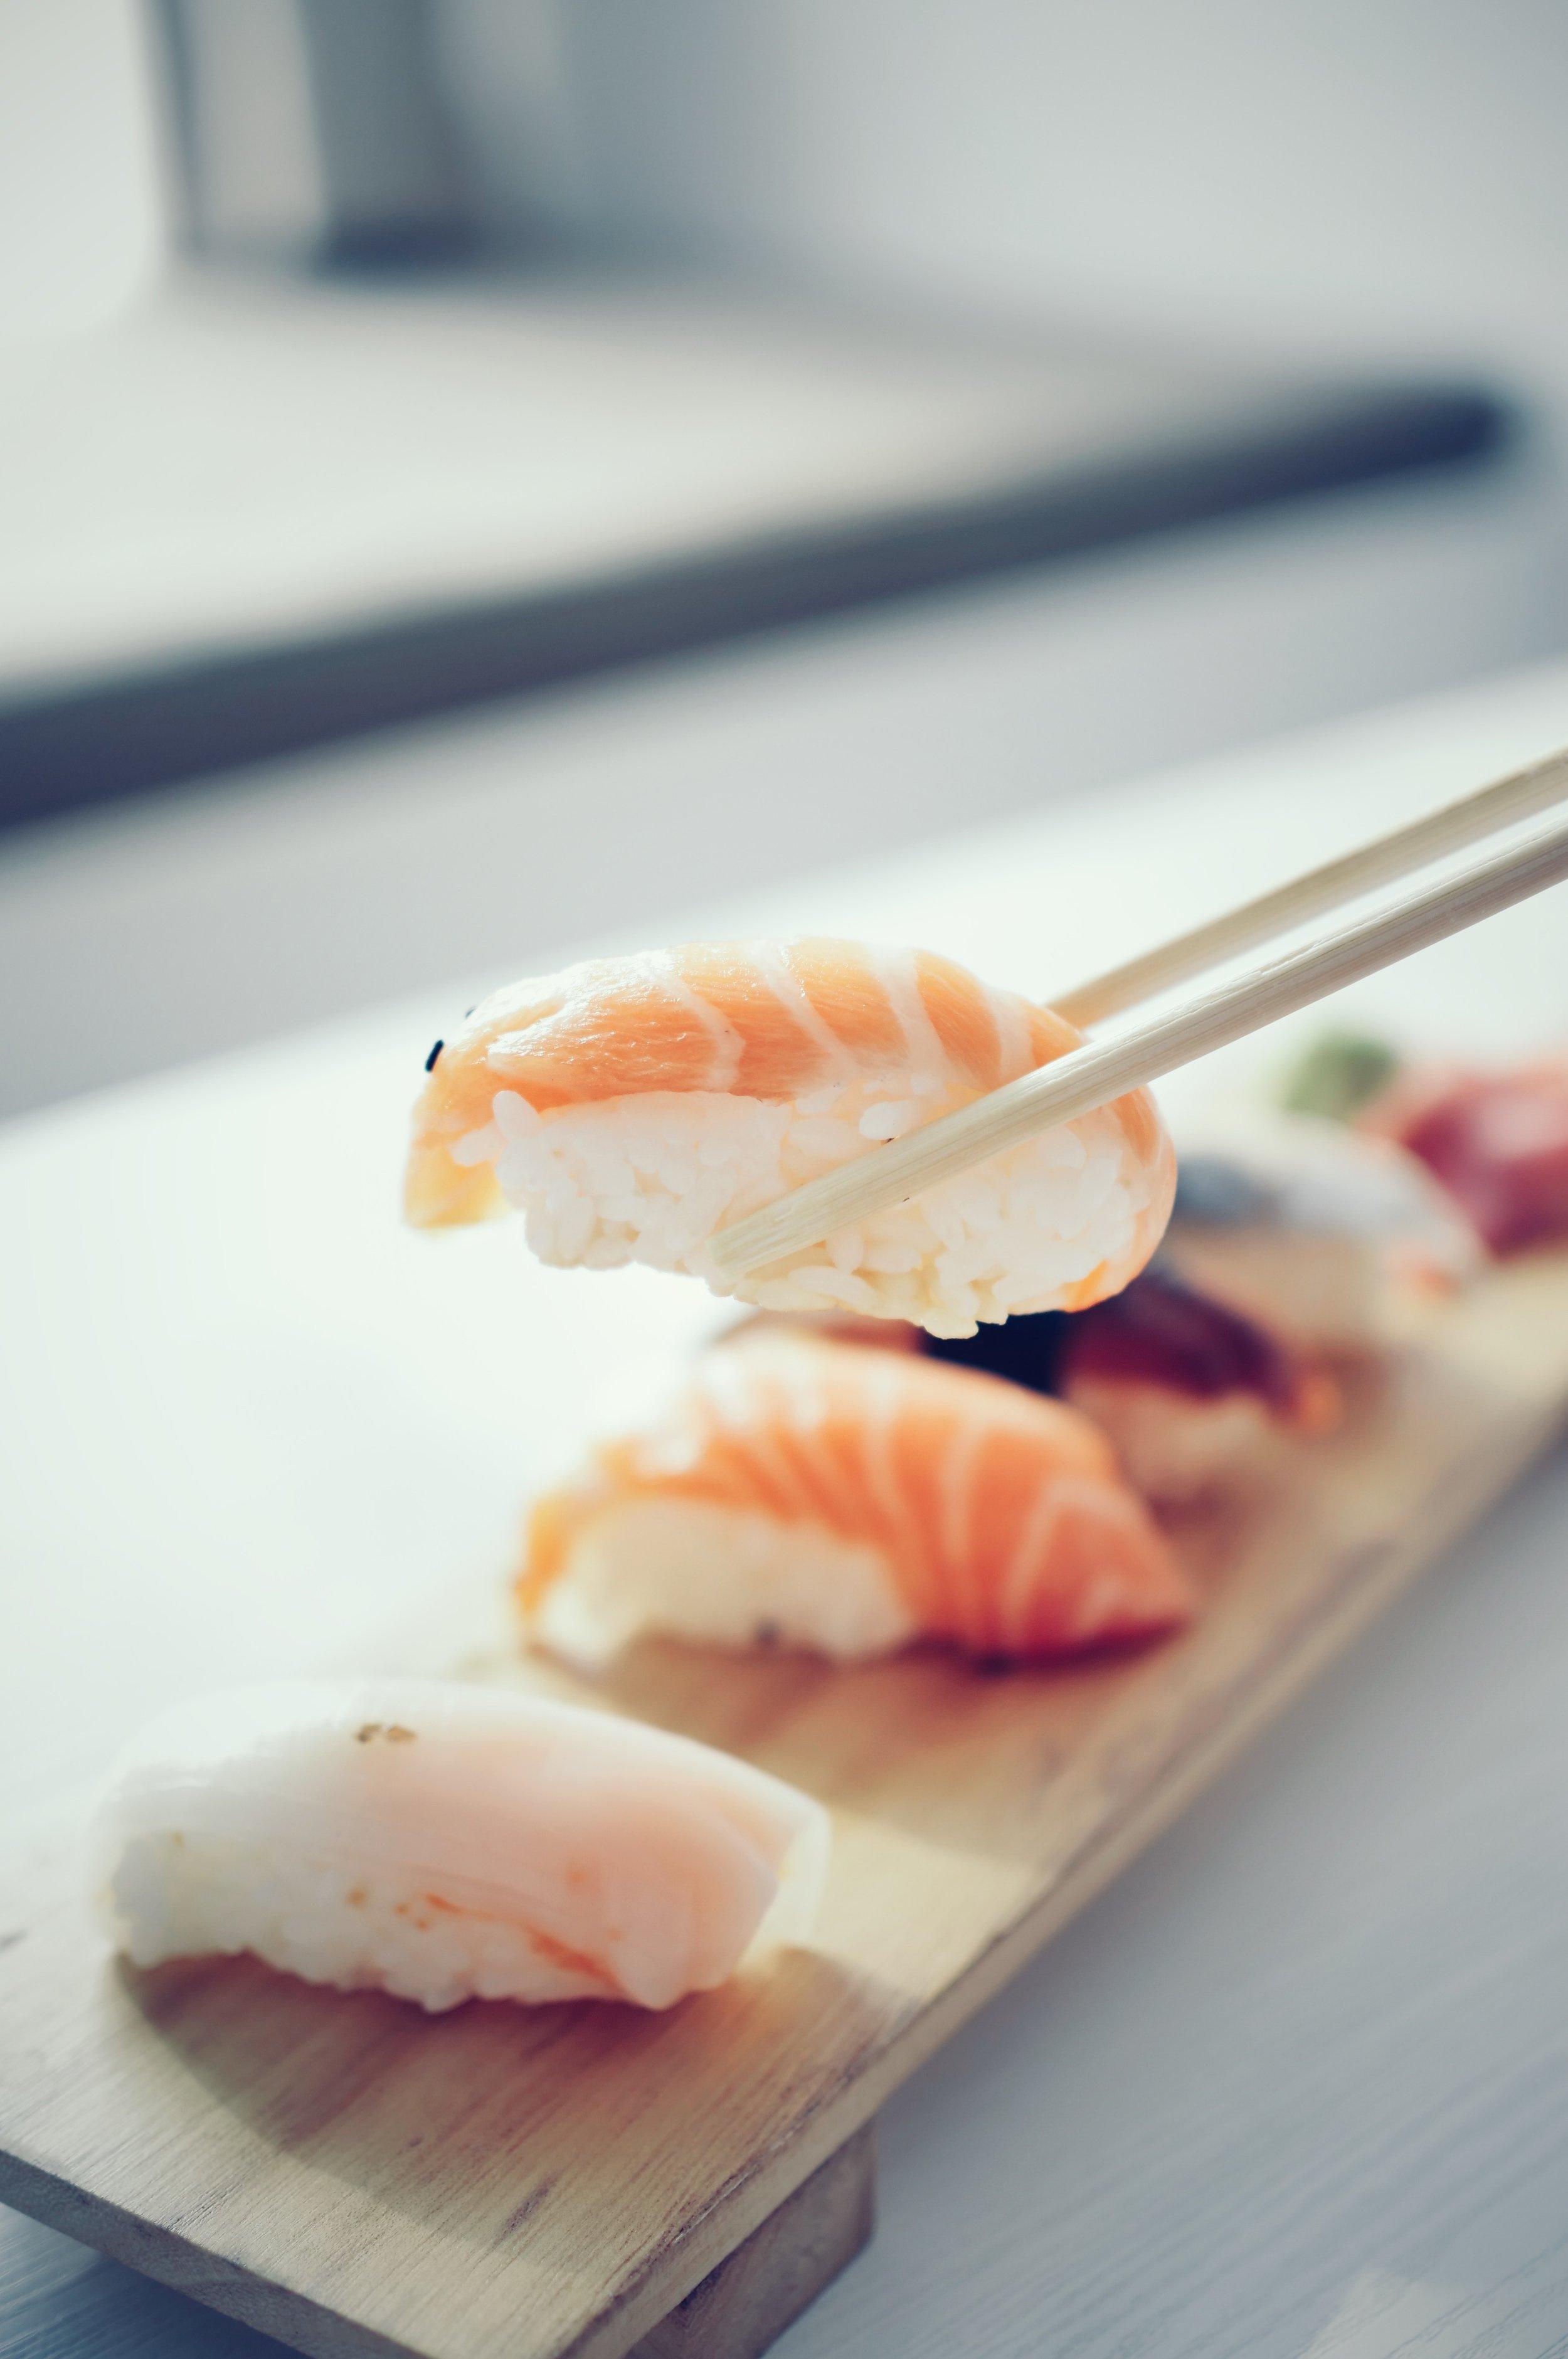 asian-food-chopsticks-delicious-1108104.jpg